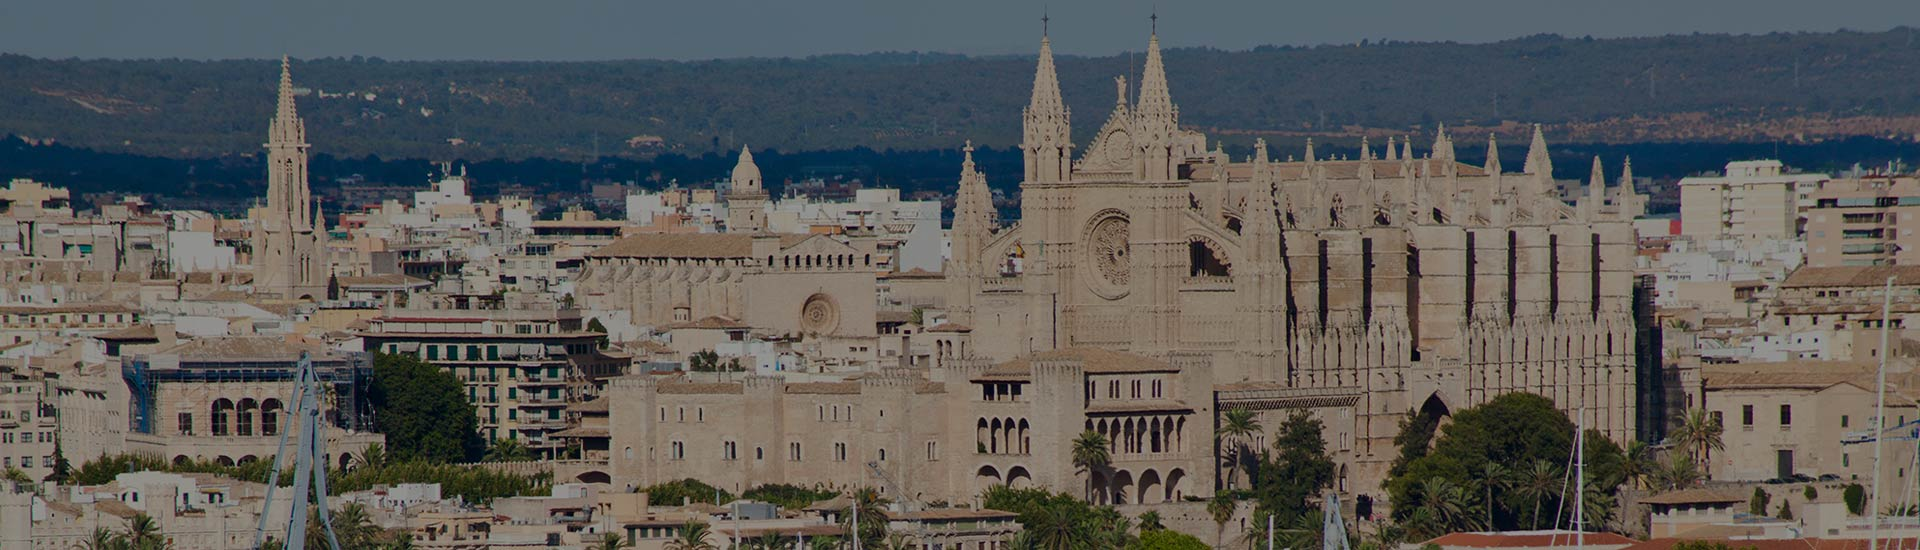 Spedition Logistikunternehmen nach Mallorca